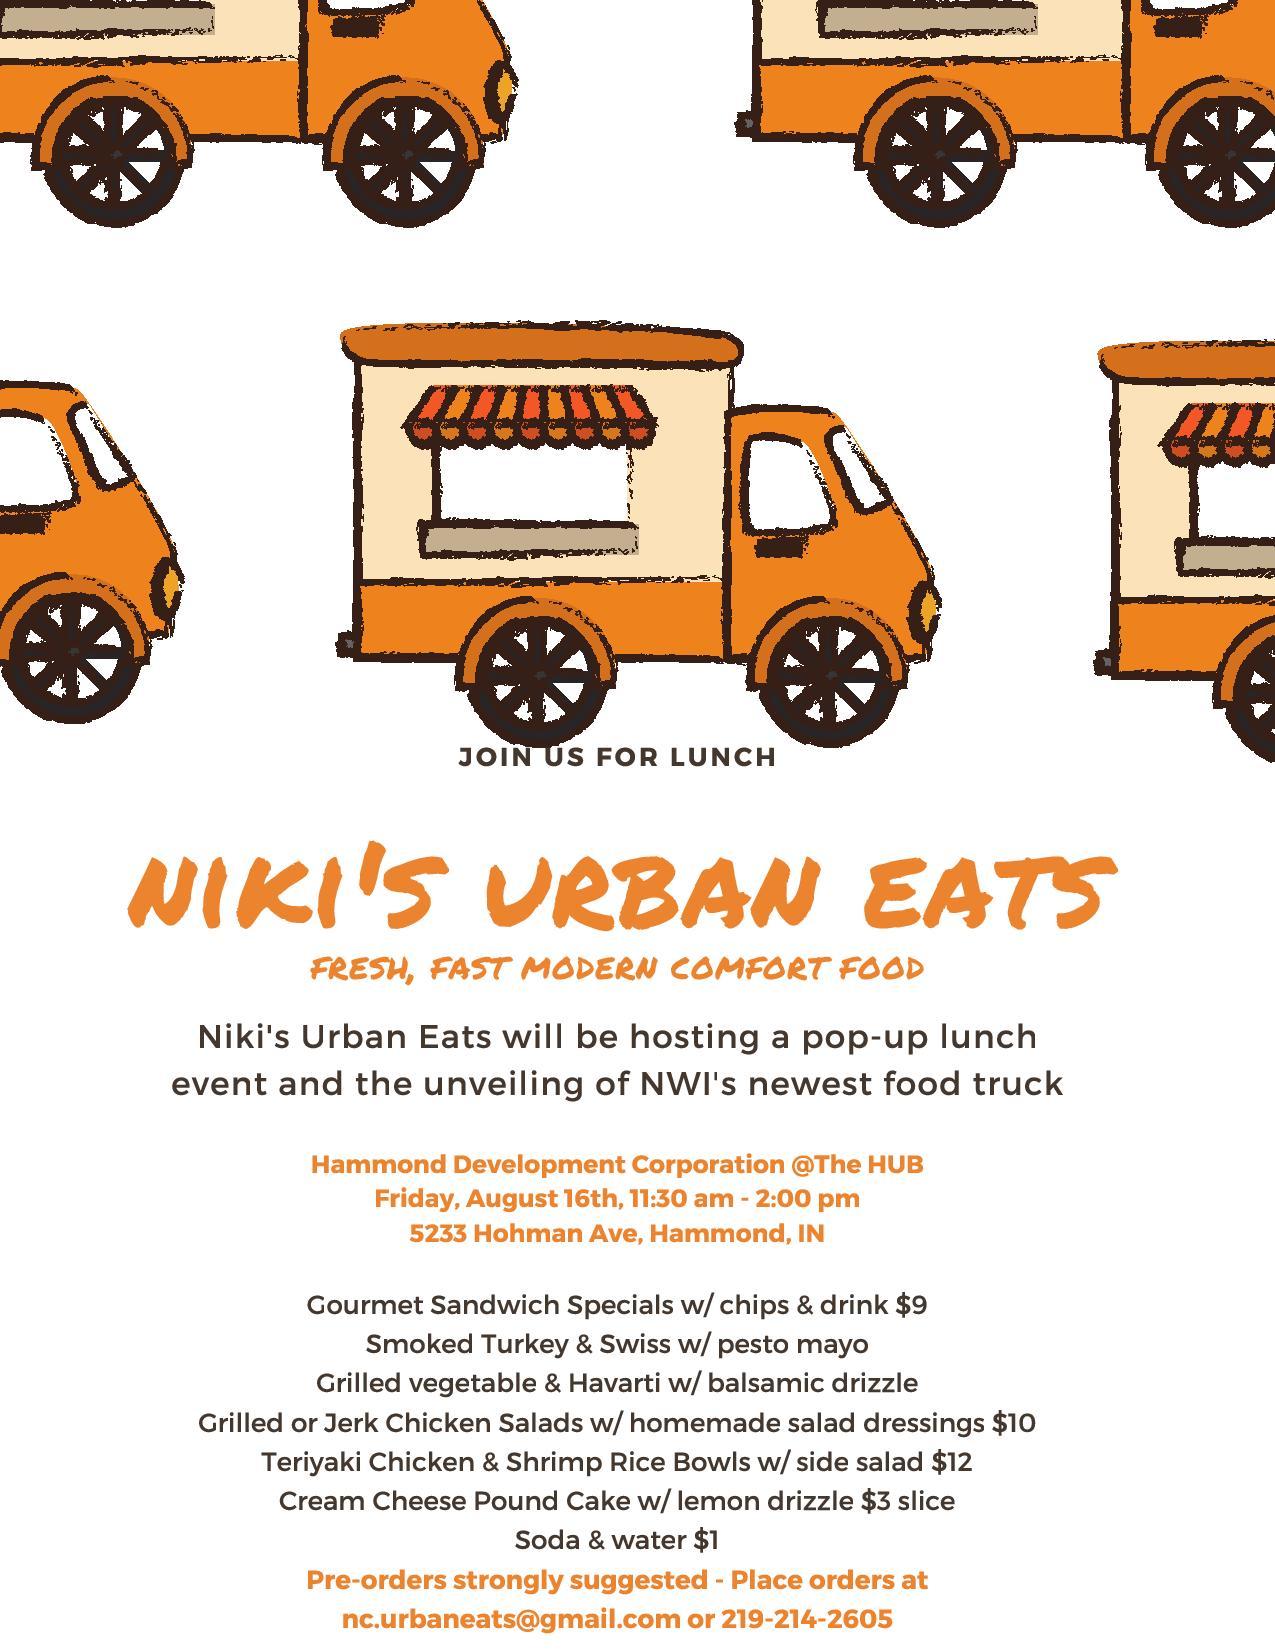 Niki s Urban Eats  HDC Pop-up (2) (1)-page-001.jpg